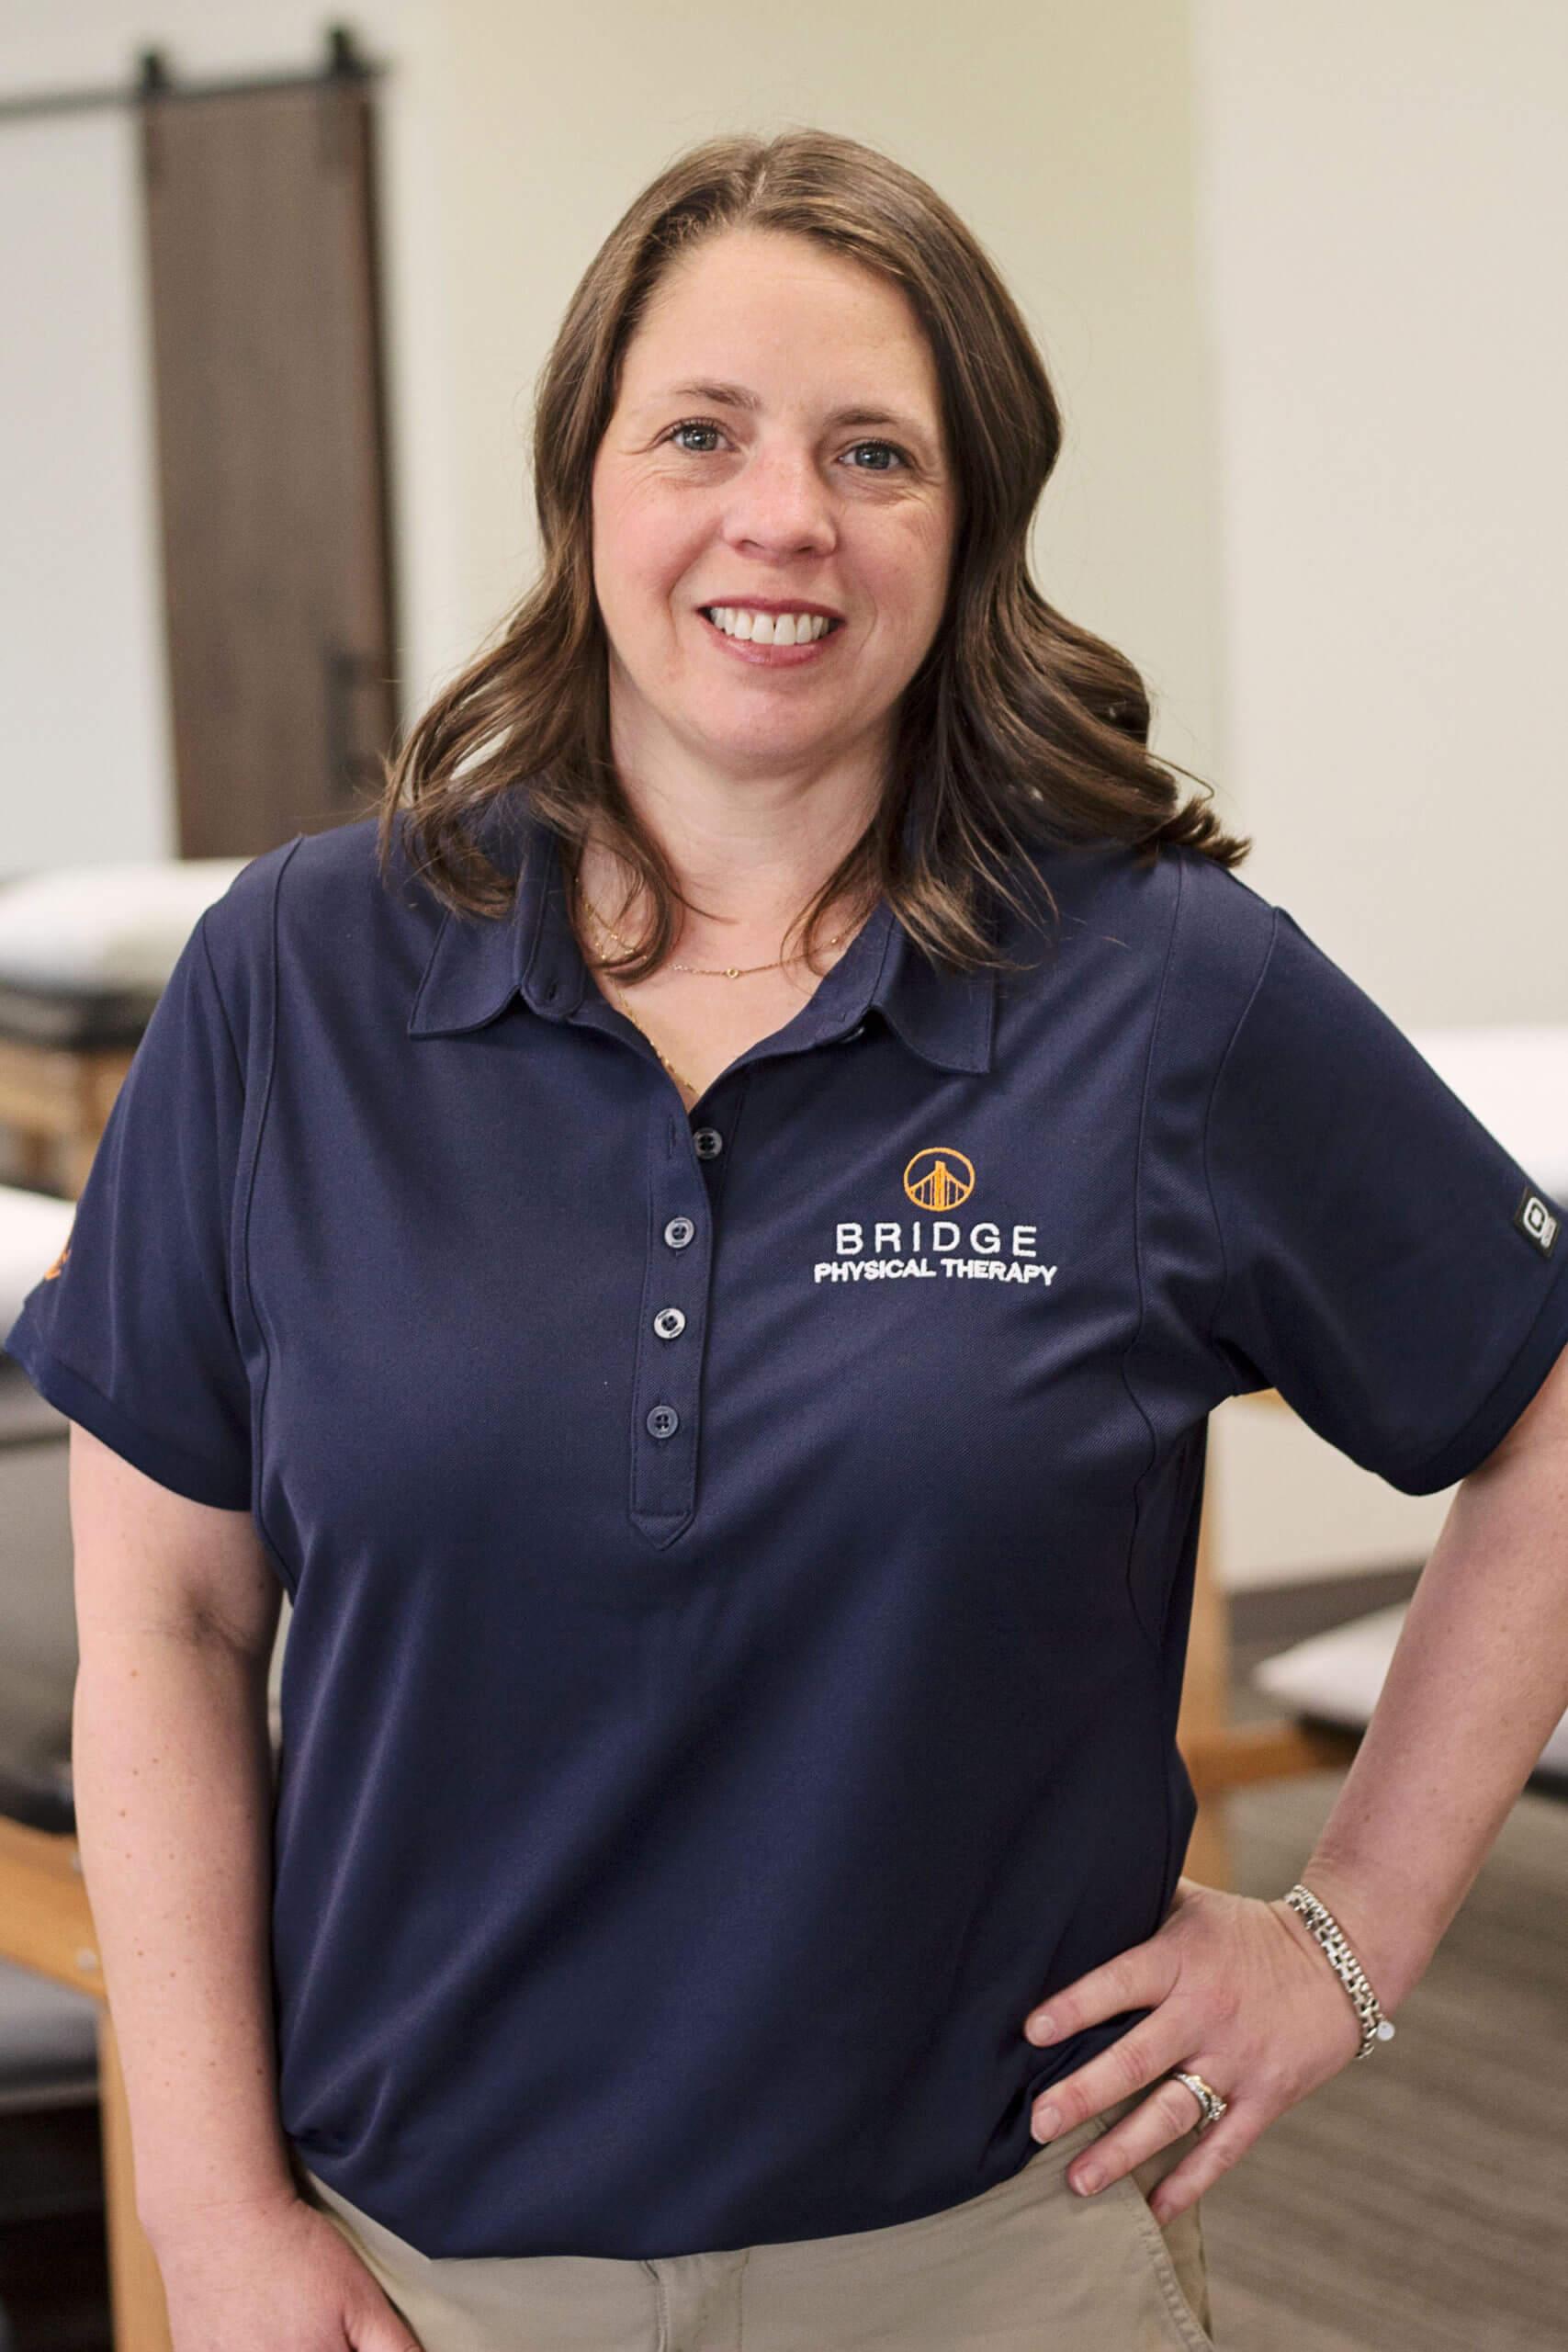 Mandy Baugher, ATC, PTA – Physical Therapist Assistant